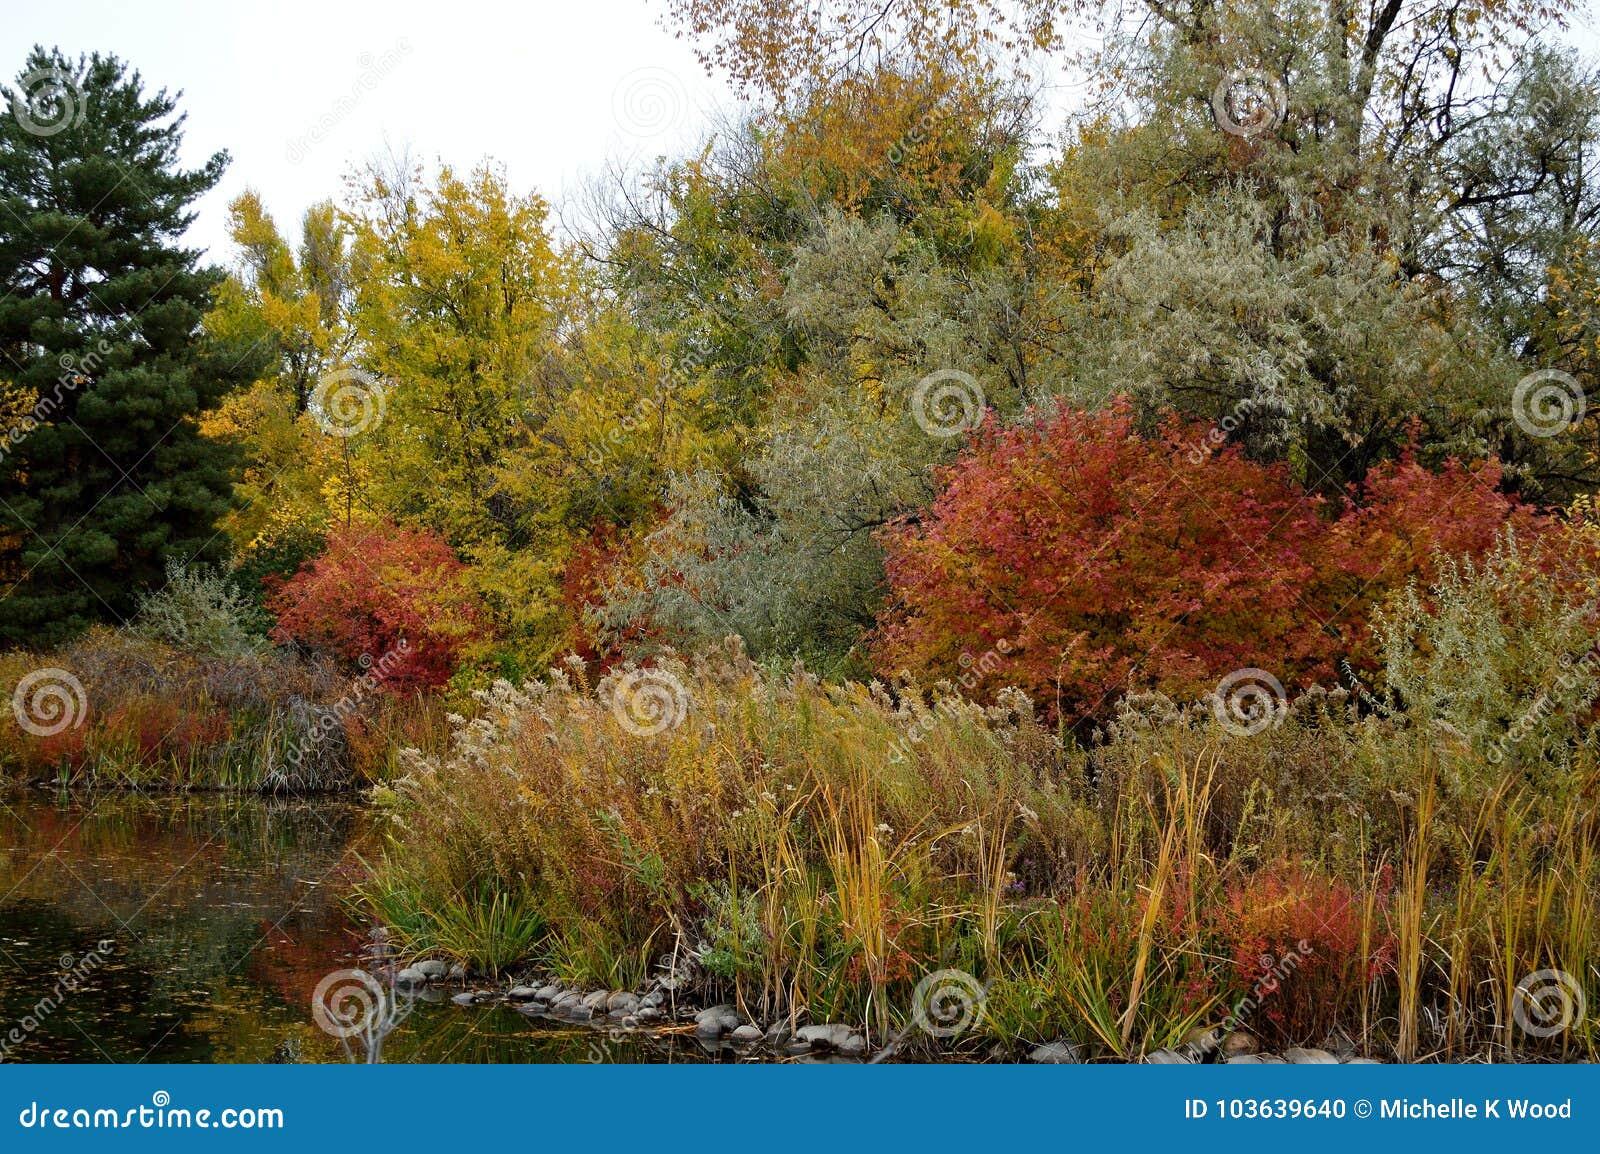 Fall Foliage Boise Idaho Albertson Park